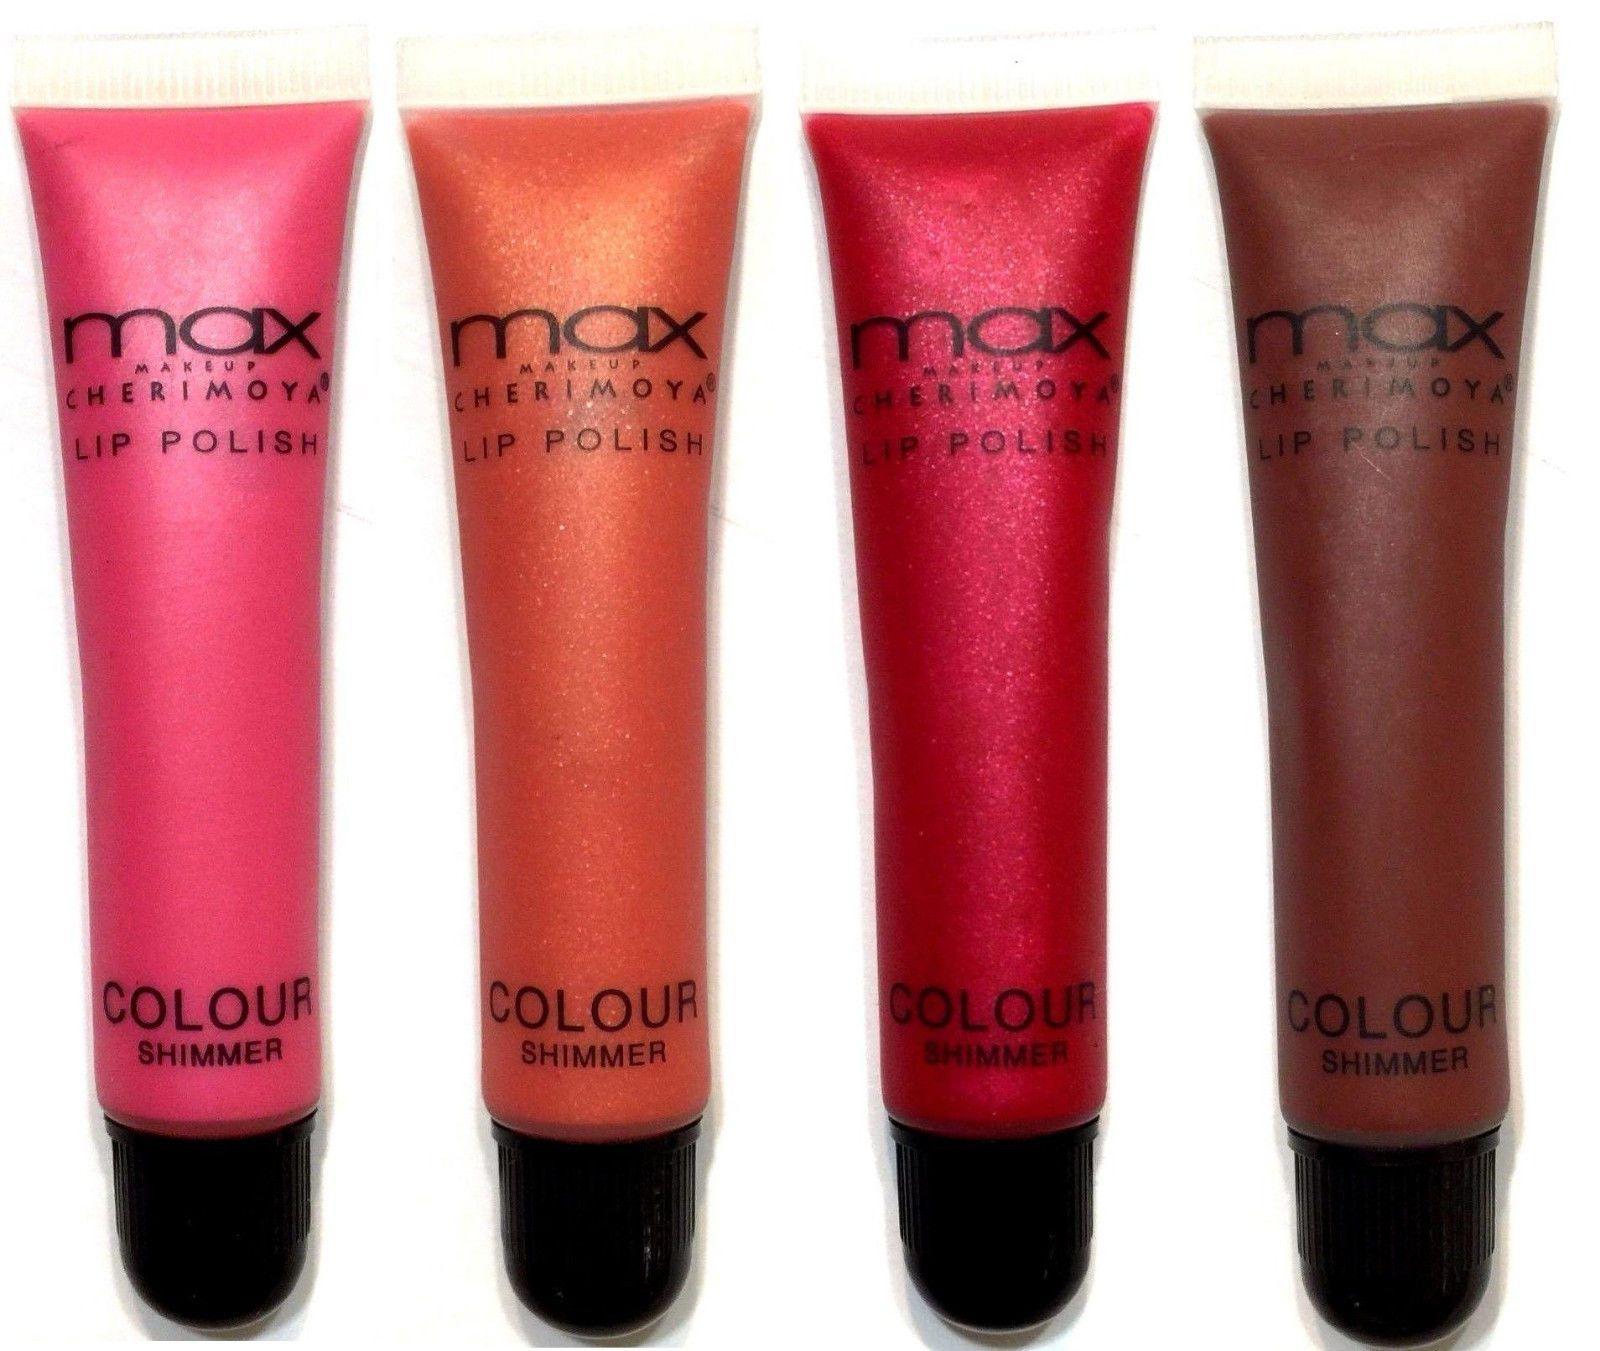 2 Pk MAX Cherimoya Makeup Gloss Lip Polish Colour Shimmer